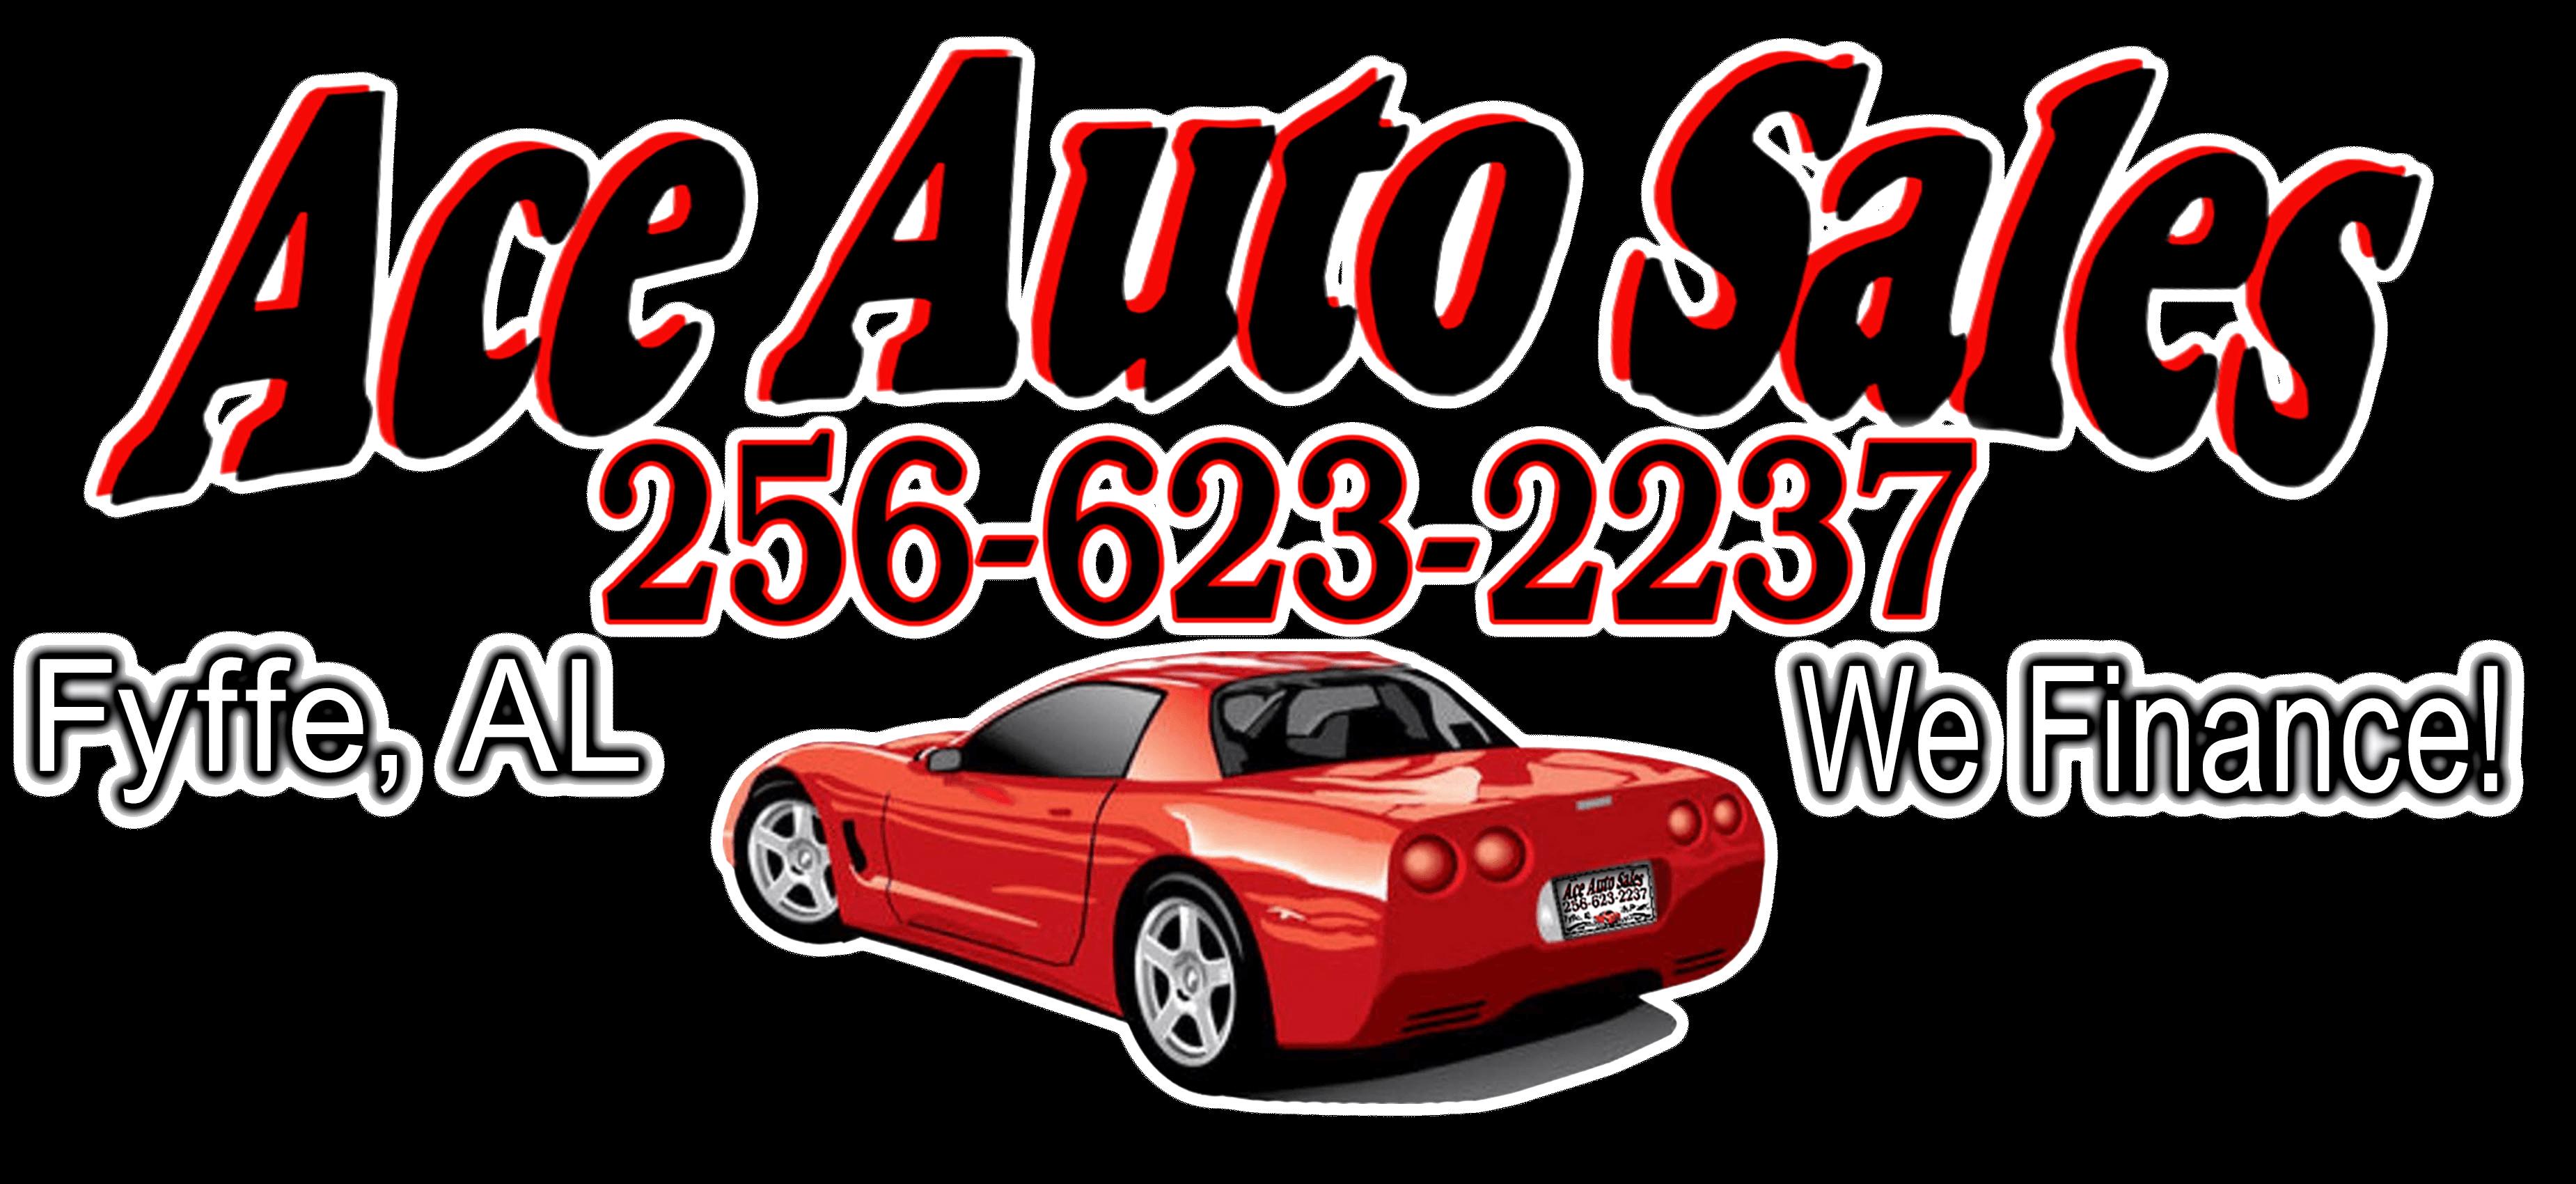 Ace Auto Sales Logo